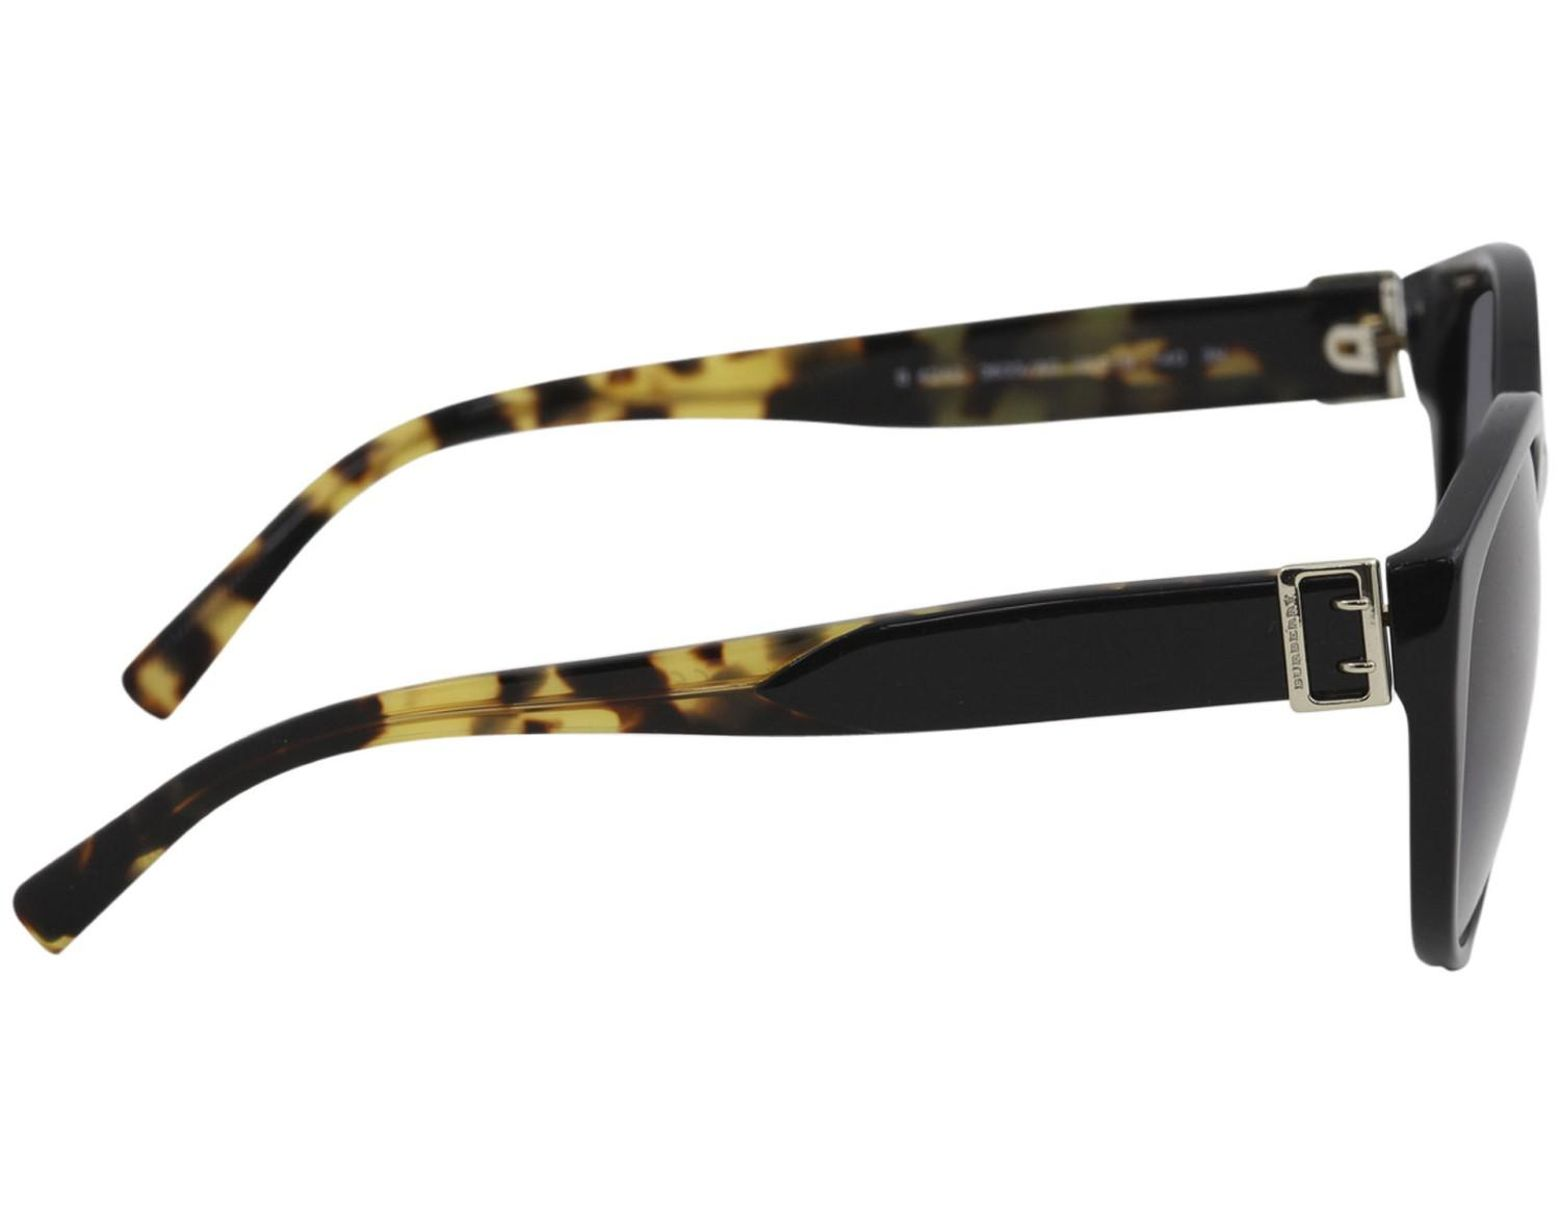 e4e29db50 Burberry Be4242 Be/4242 3633/8g Fashion Round Sunglasses 55mm in Black -  Lyst